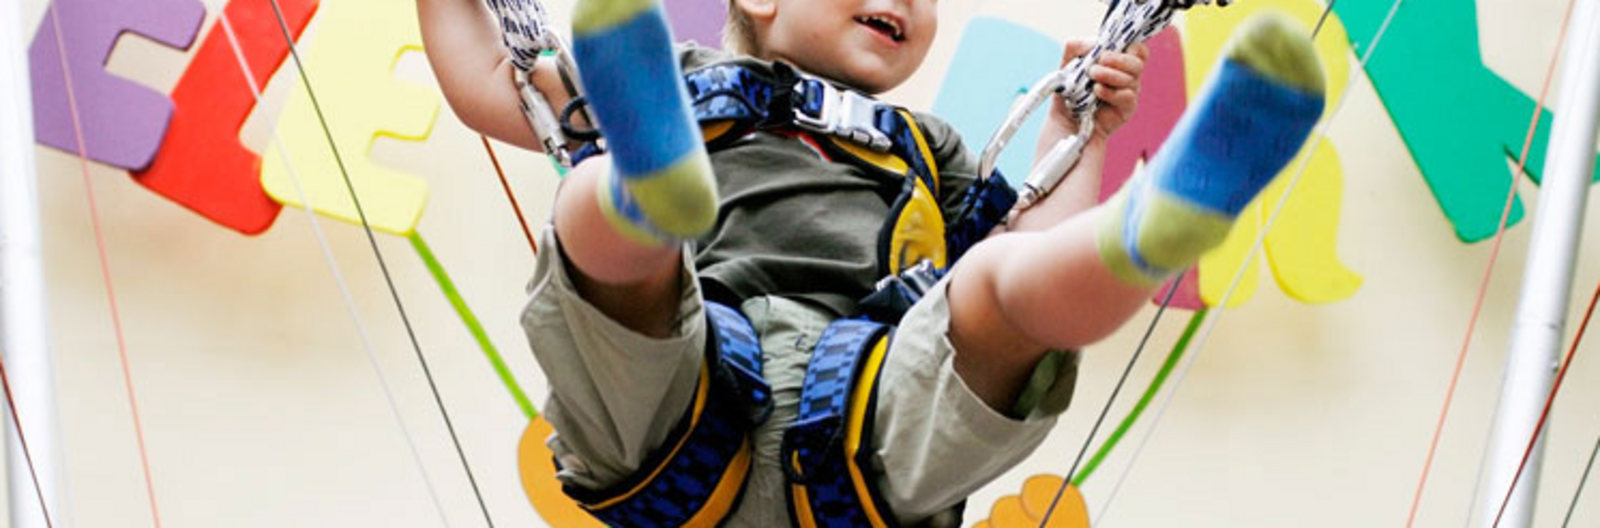 10 remek gyerekprogram Budapesten